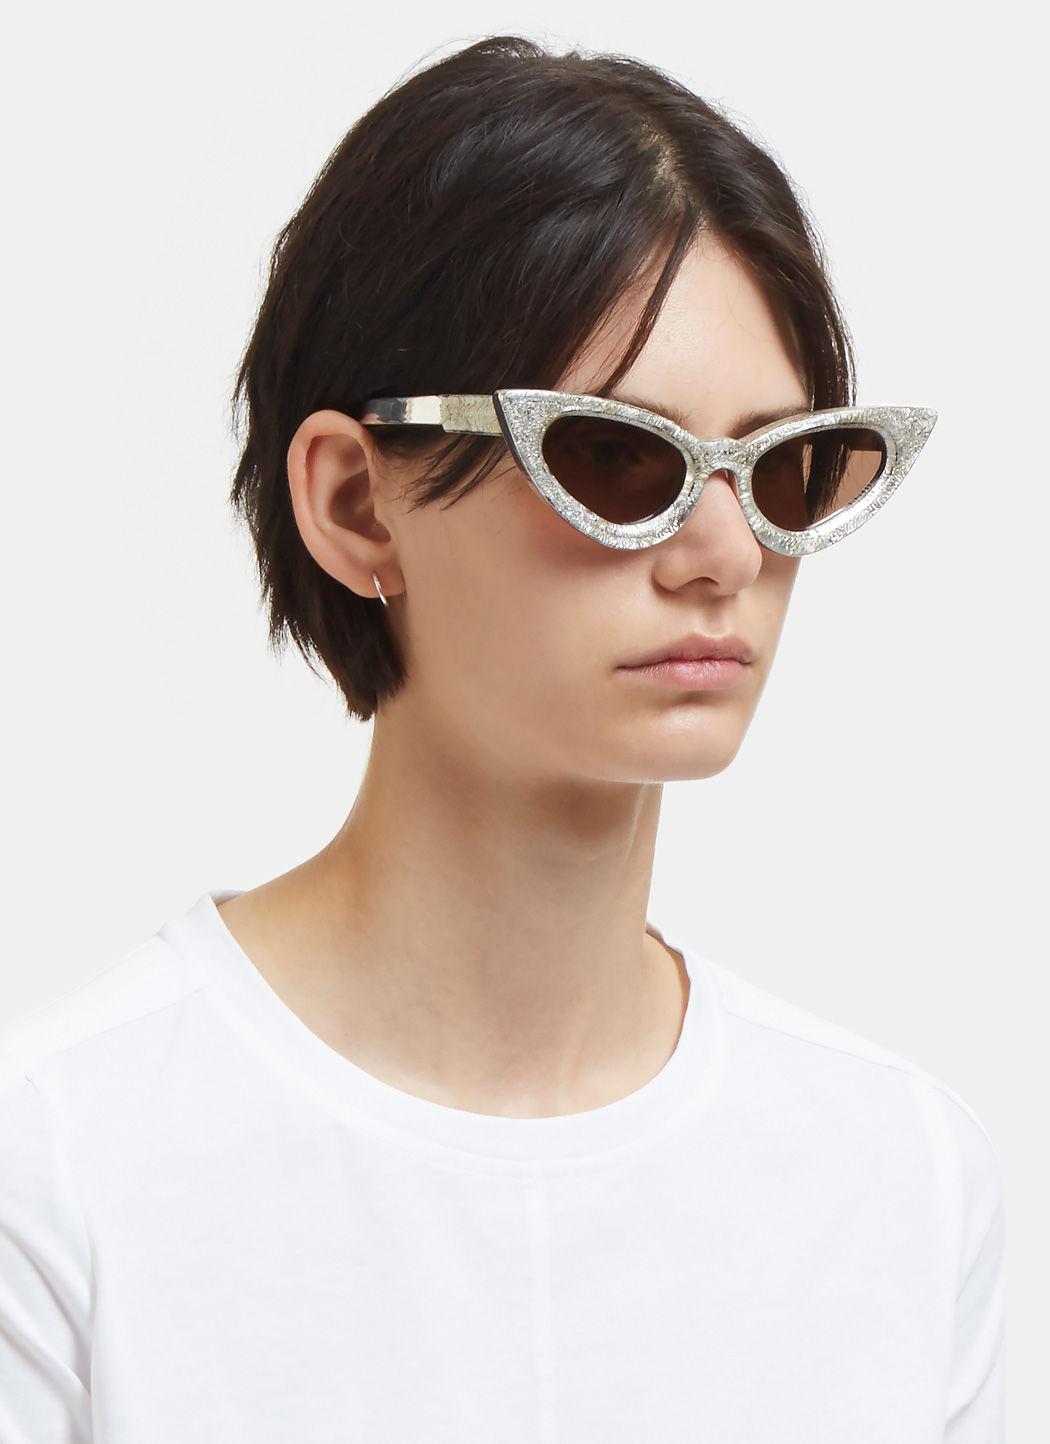 Buy Shop Glasses Sunglasses Online Cat Eye Eyeglasses Cateye Designer Fashion Trend kuboruam y3 mask